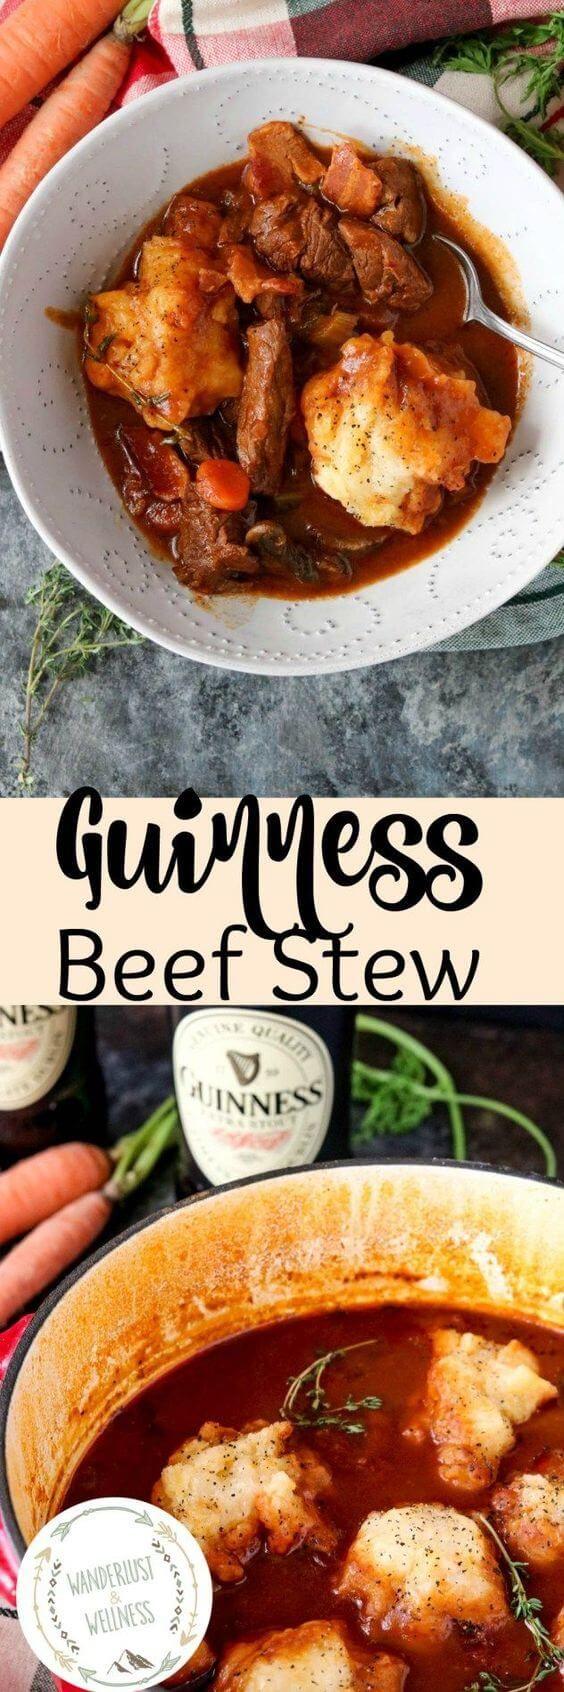 Guinness Beef Stew with Gluten-Free Garlic Cheddar Dumplings Recipe